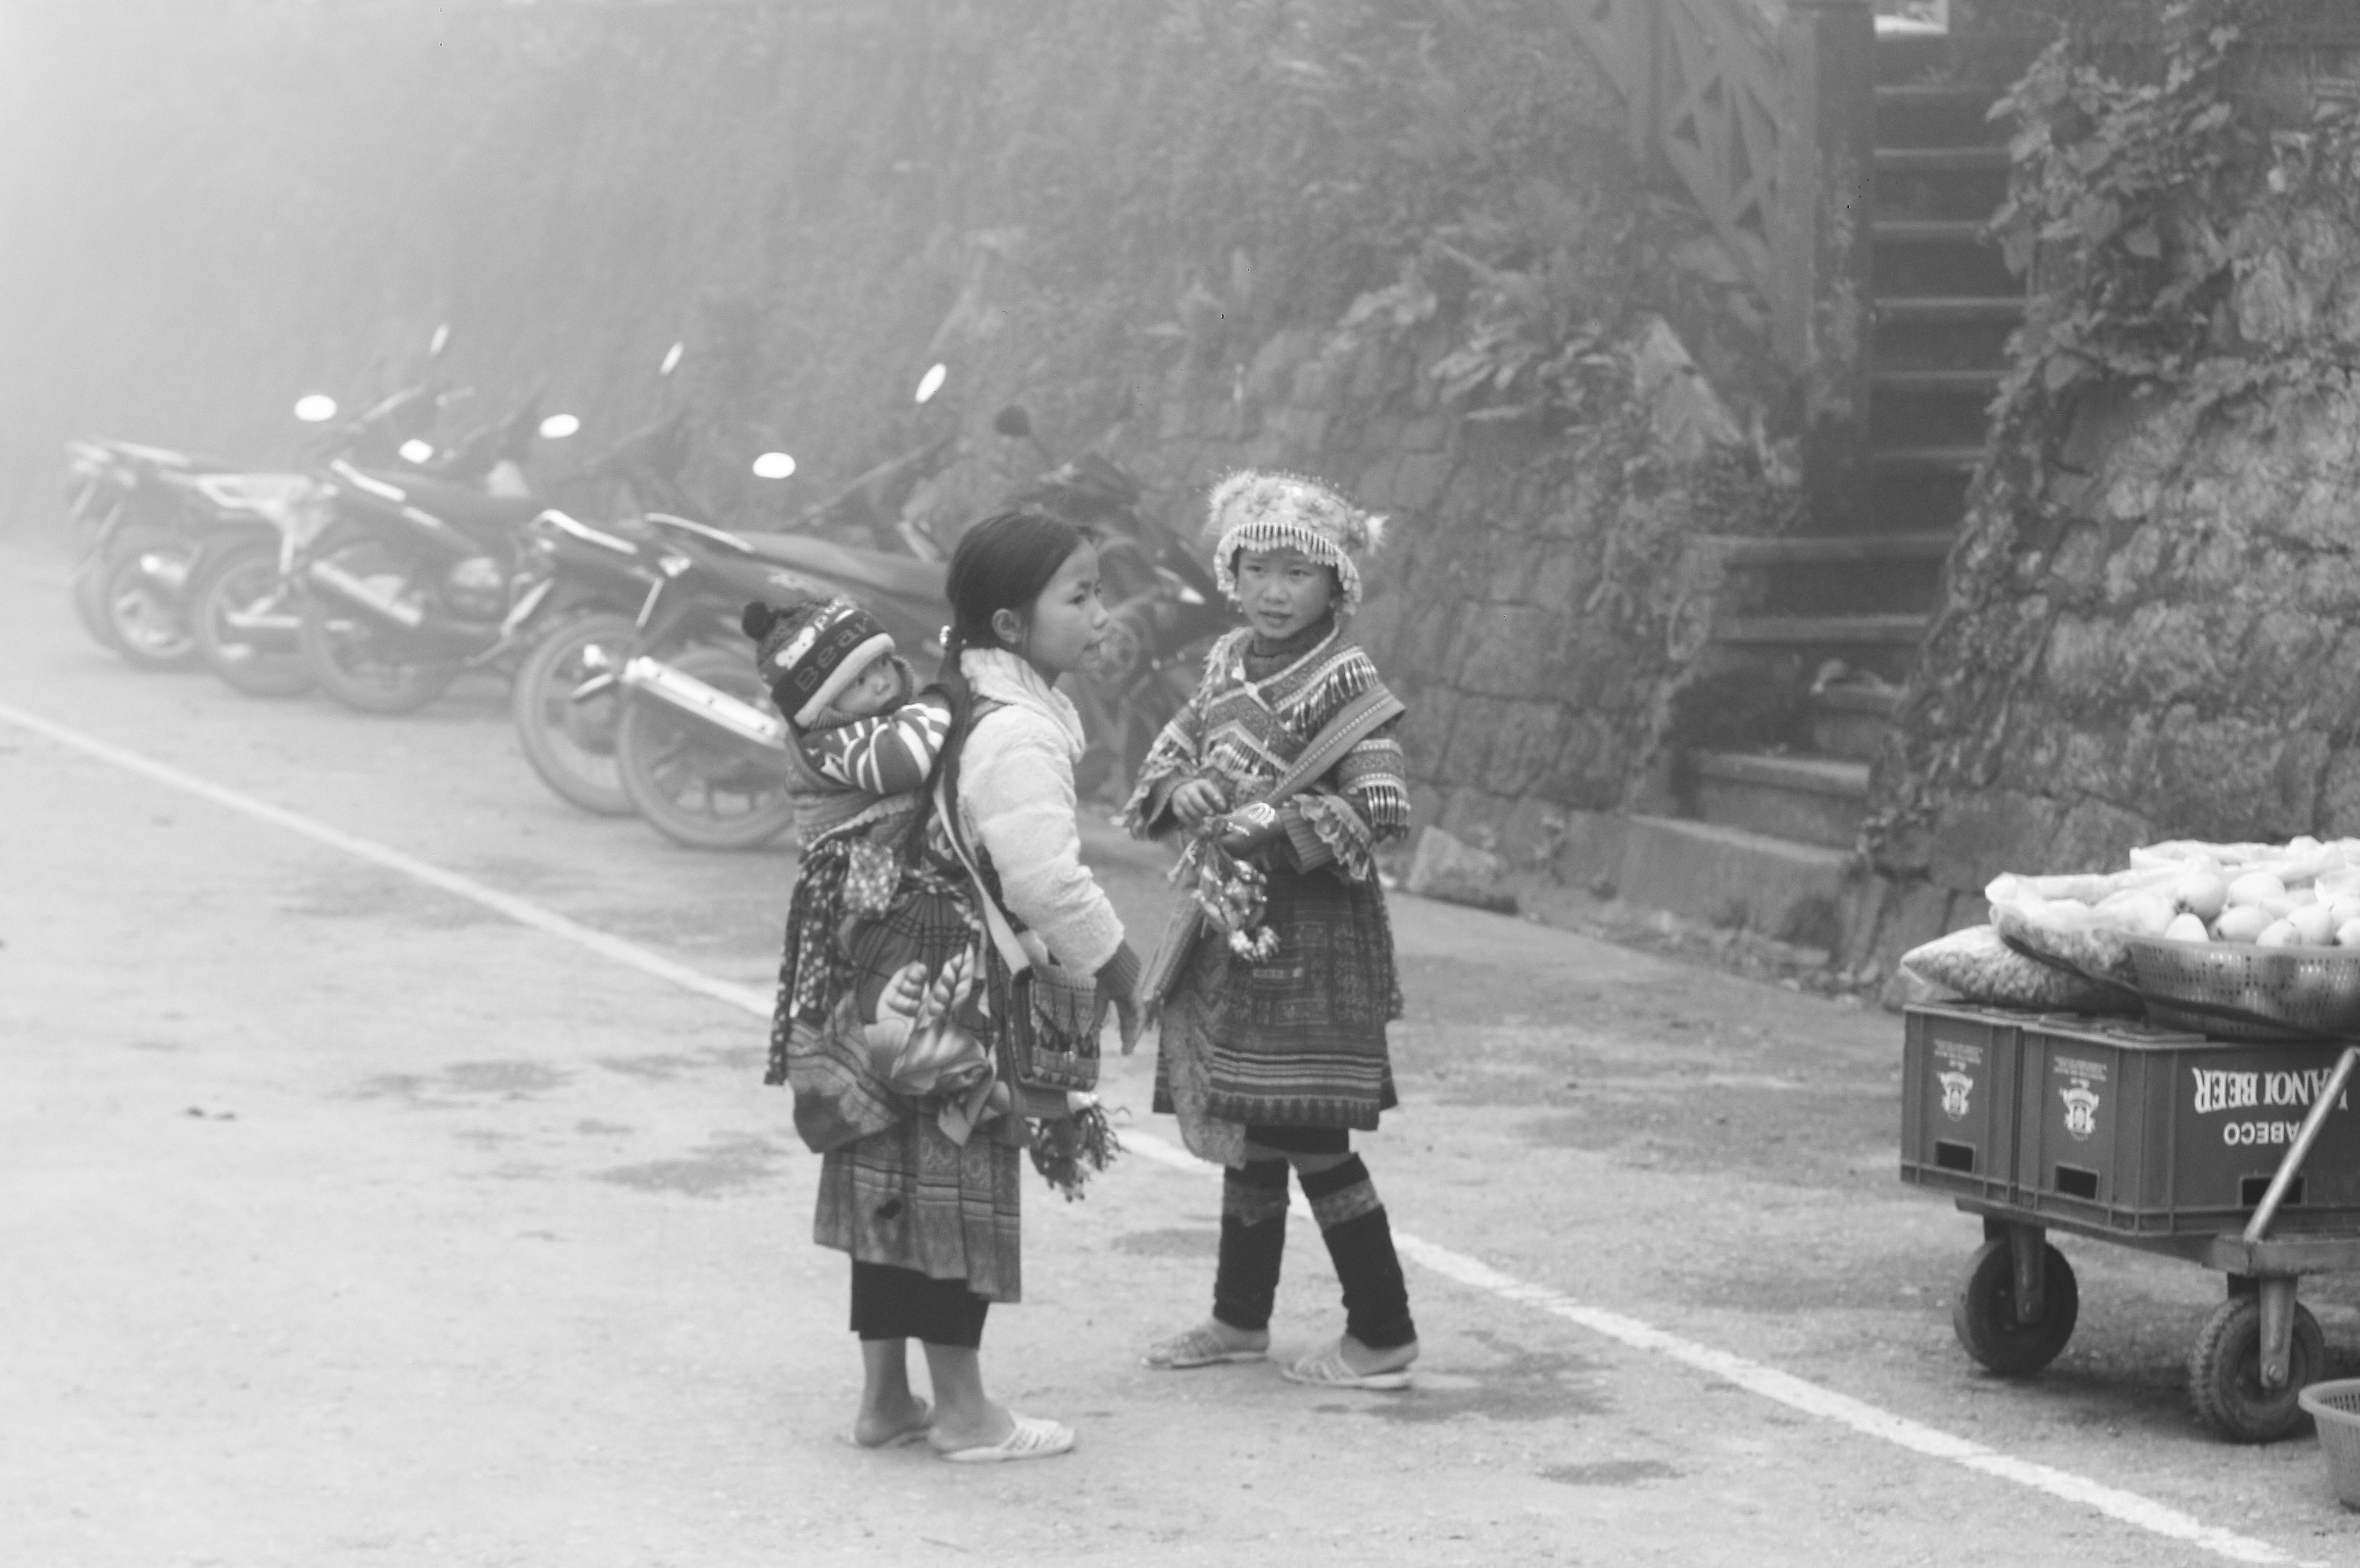 Marvellous Pictures of Vietnam by Manon Esnouf